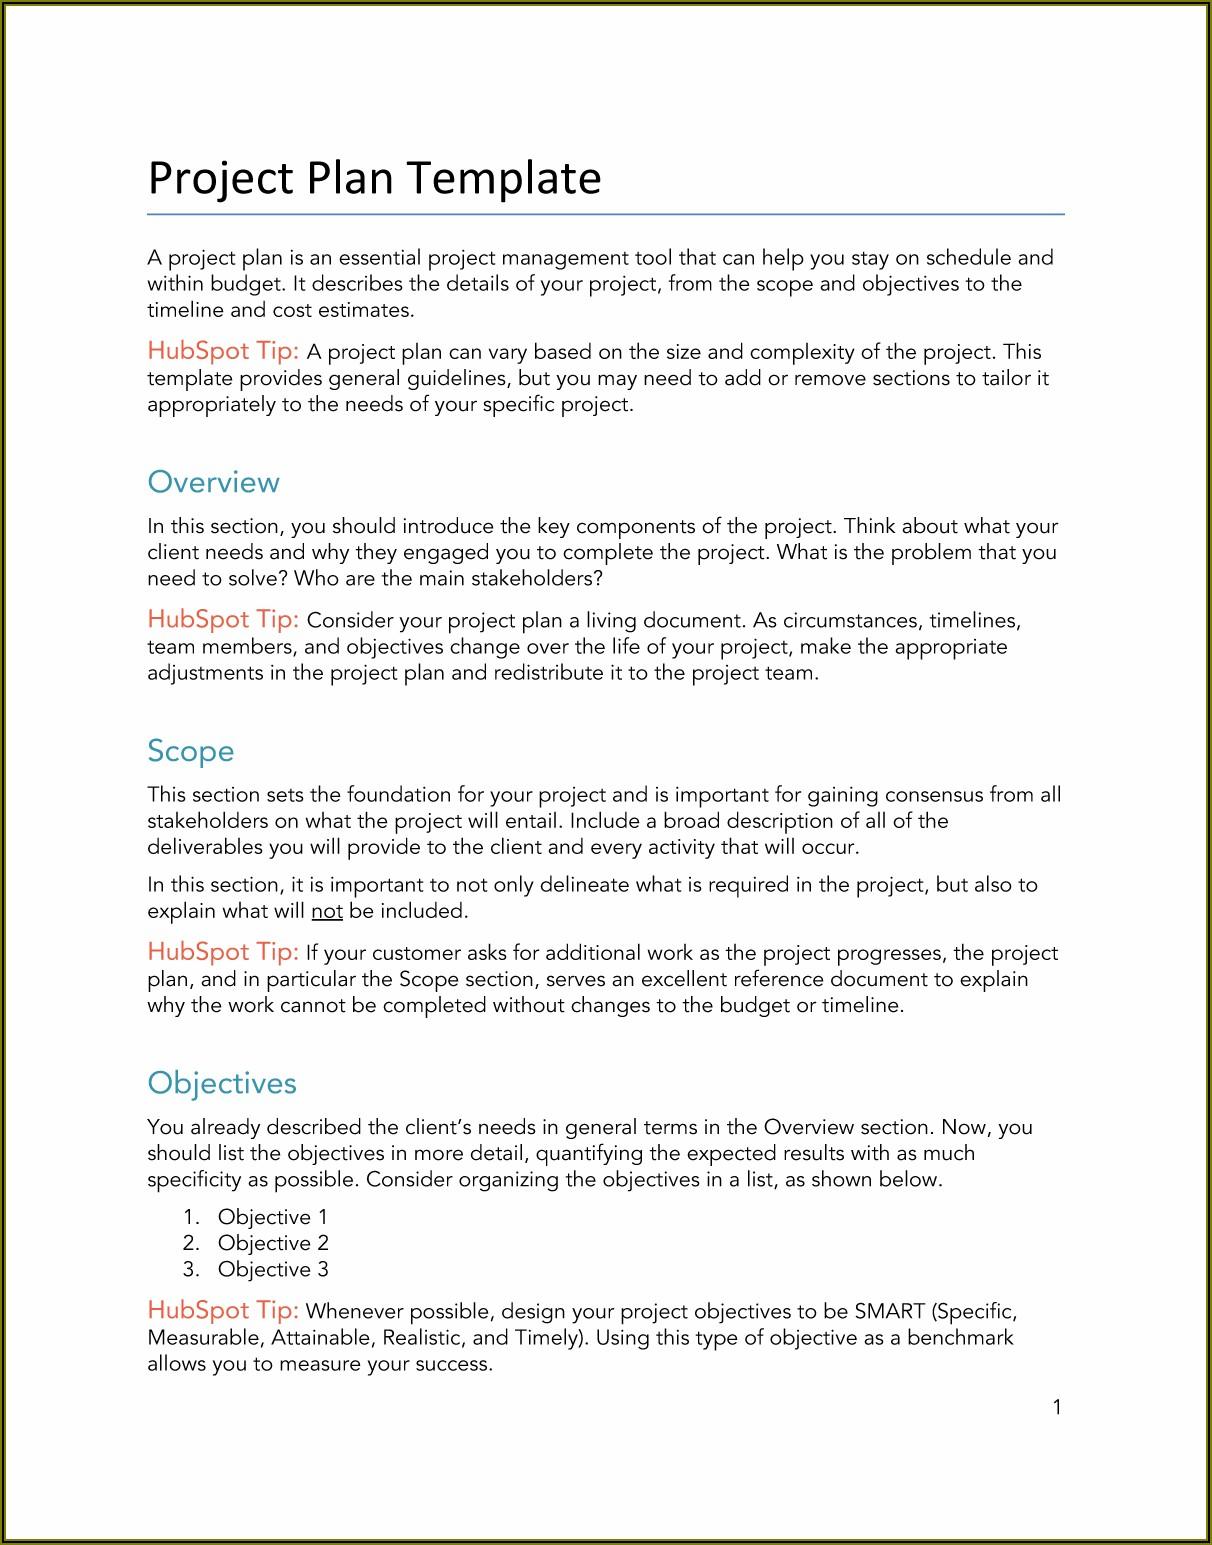 Project Plan Template Google Docs